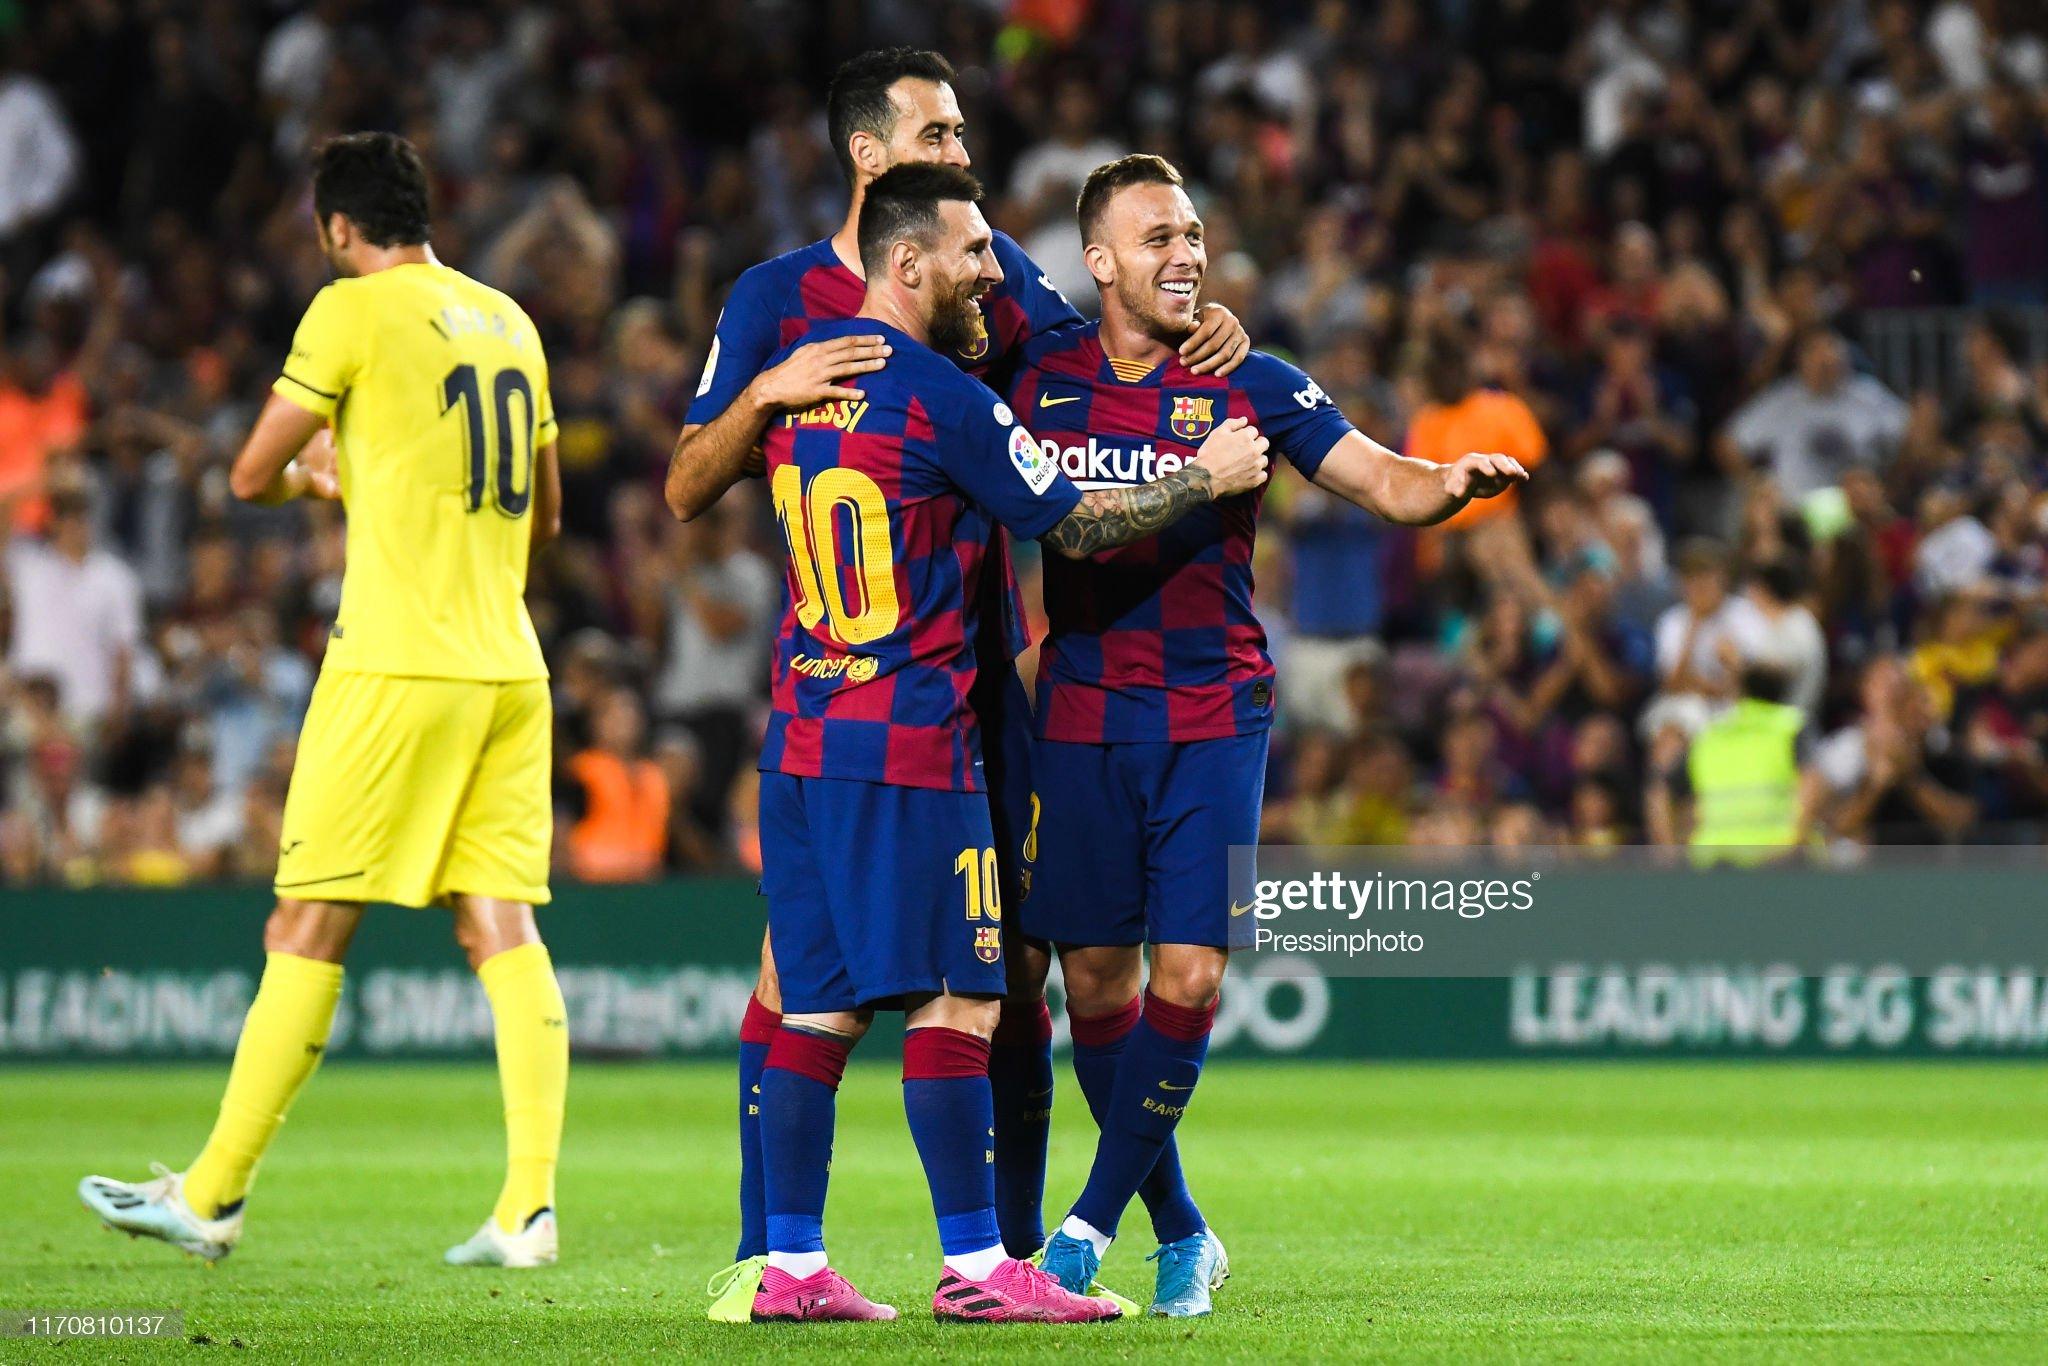 صور مباراة : برشلونة - فياريال 2-1 ( 24-09-2019 )  Arthur-melo-of-fc-barcelona-celebrates-his-goal-with-his-teammates-picture-id1170810137?s=2048x2048